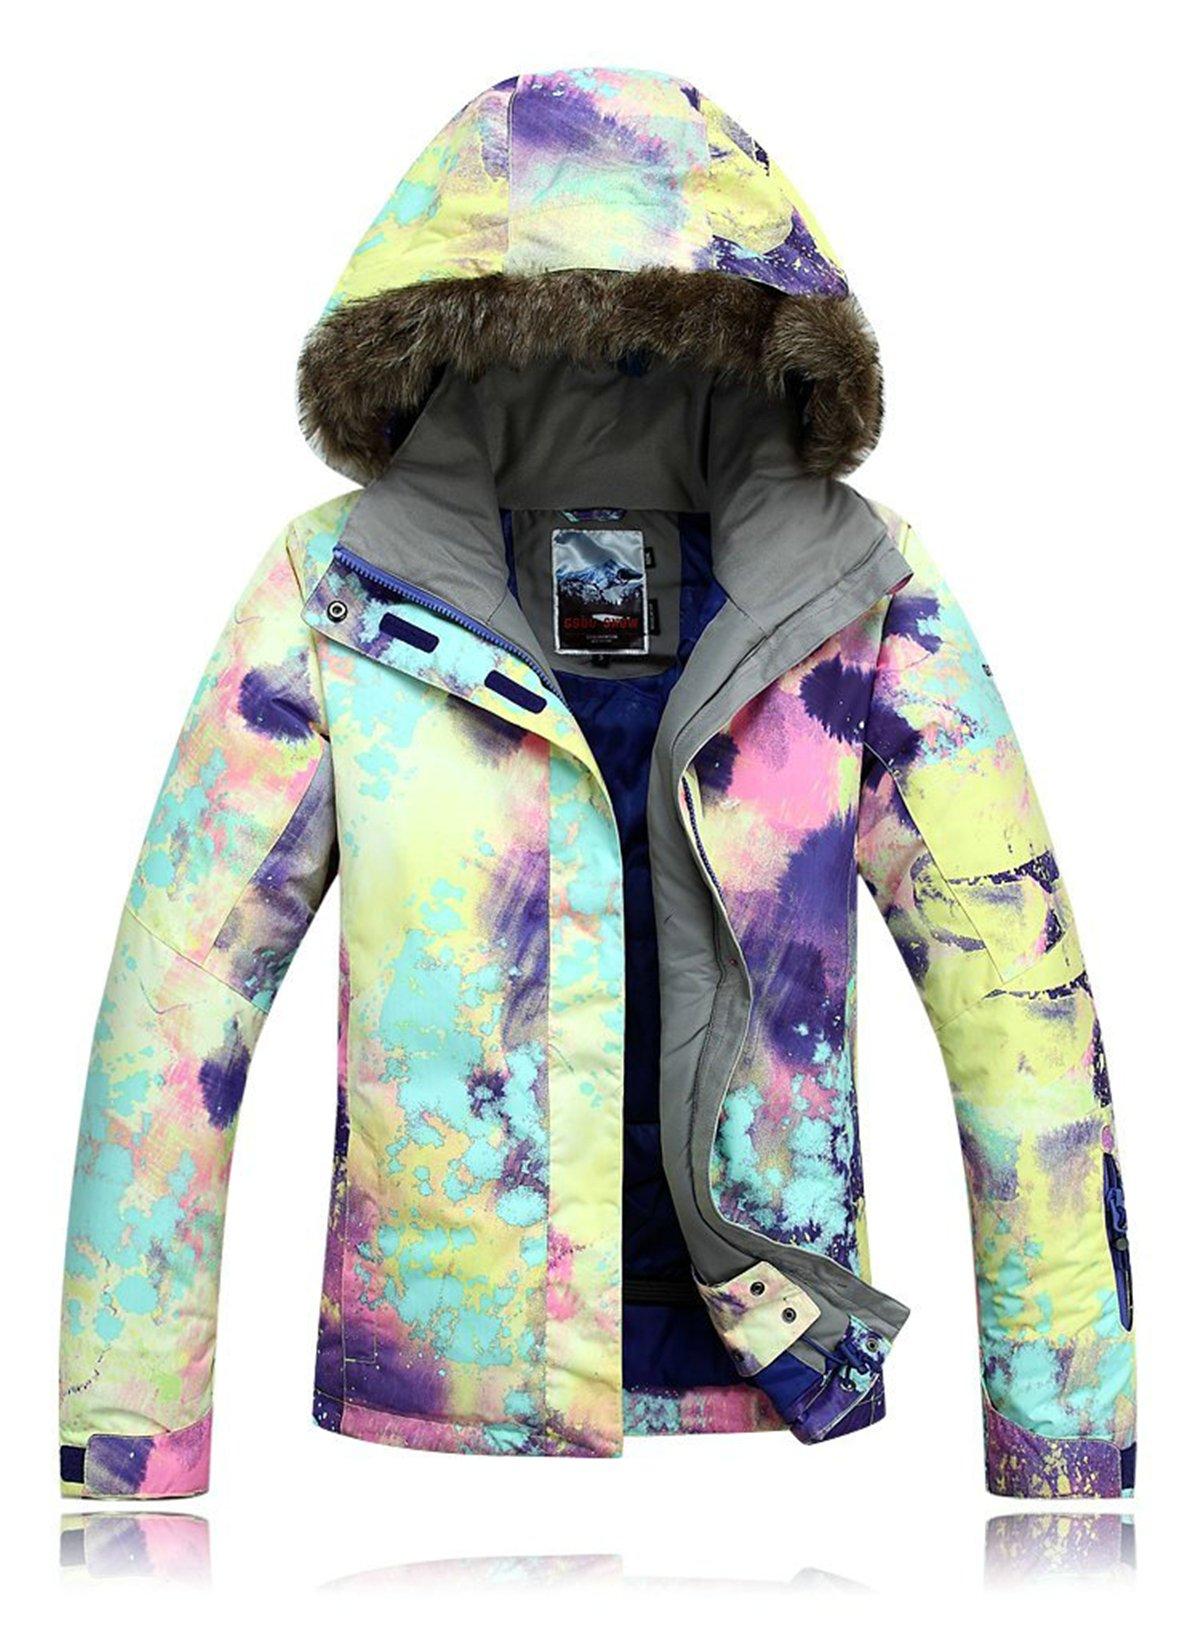 APTRO Women's High Windproof Technology Colorfull Printed Ski Jacket Style #21 Size M by APTRO